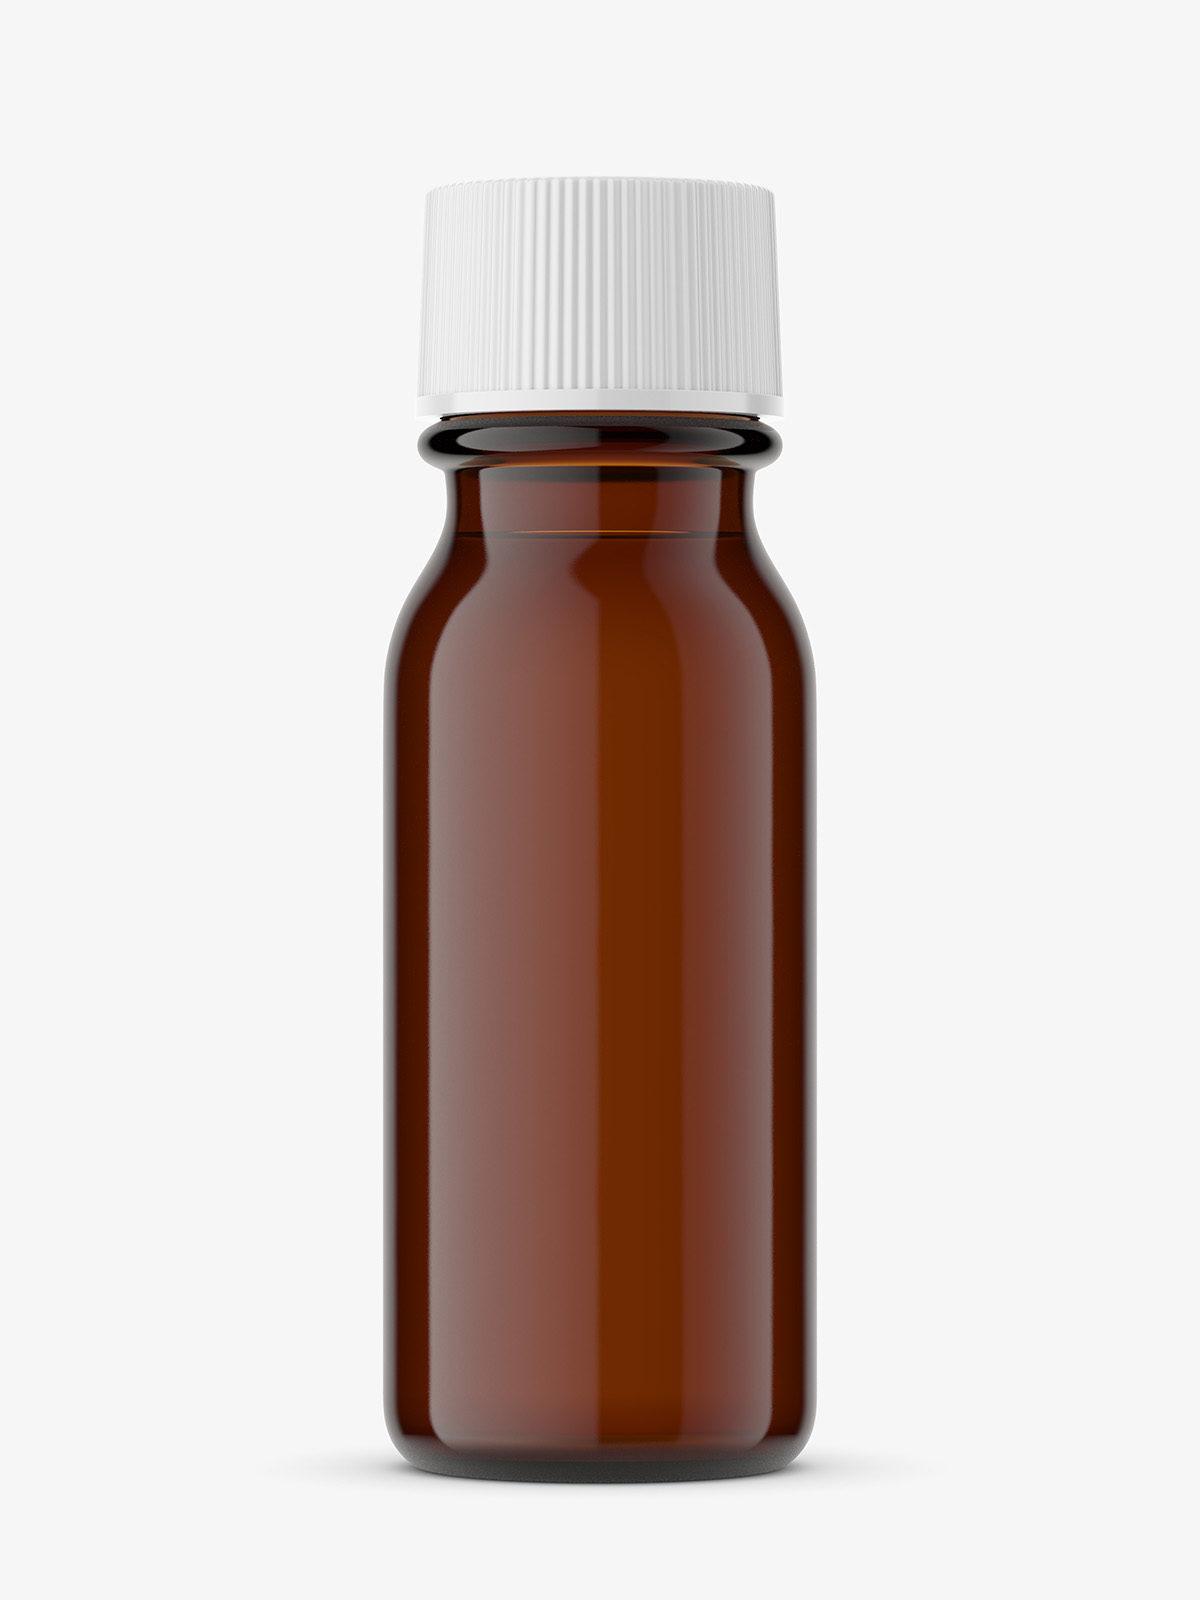 Benefits Of Amber Glass Bottles